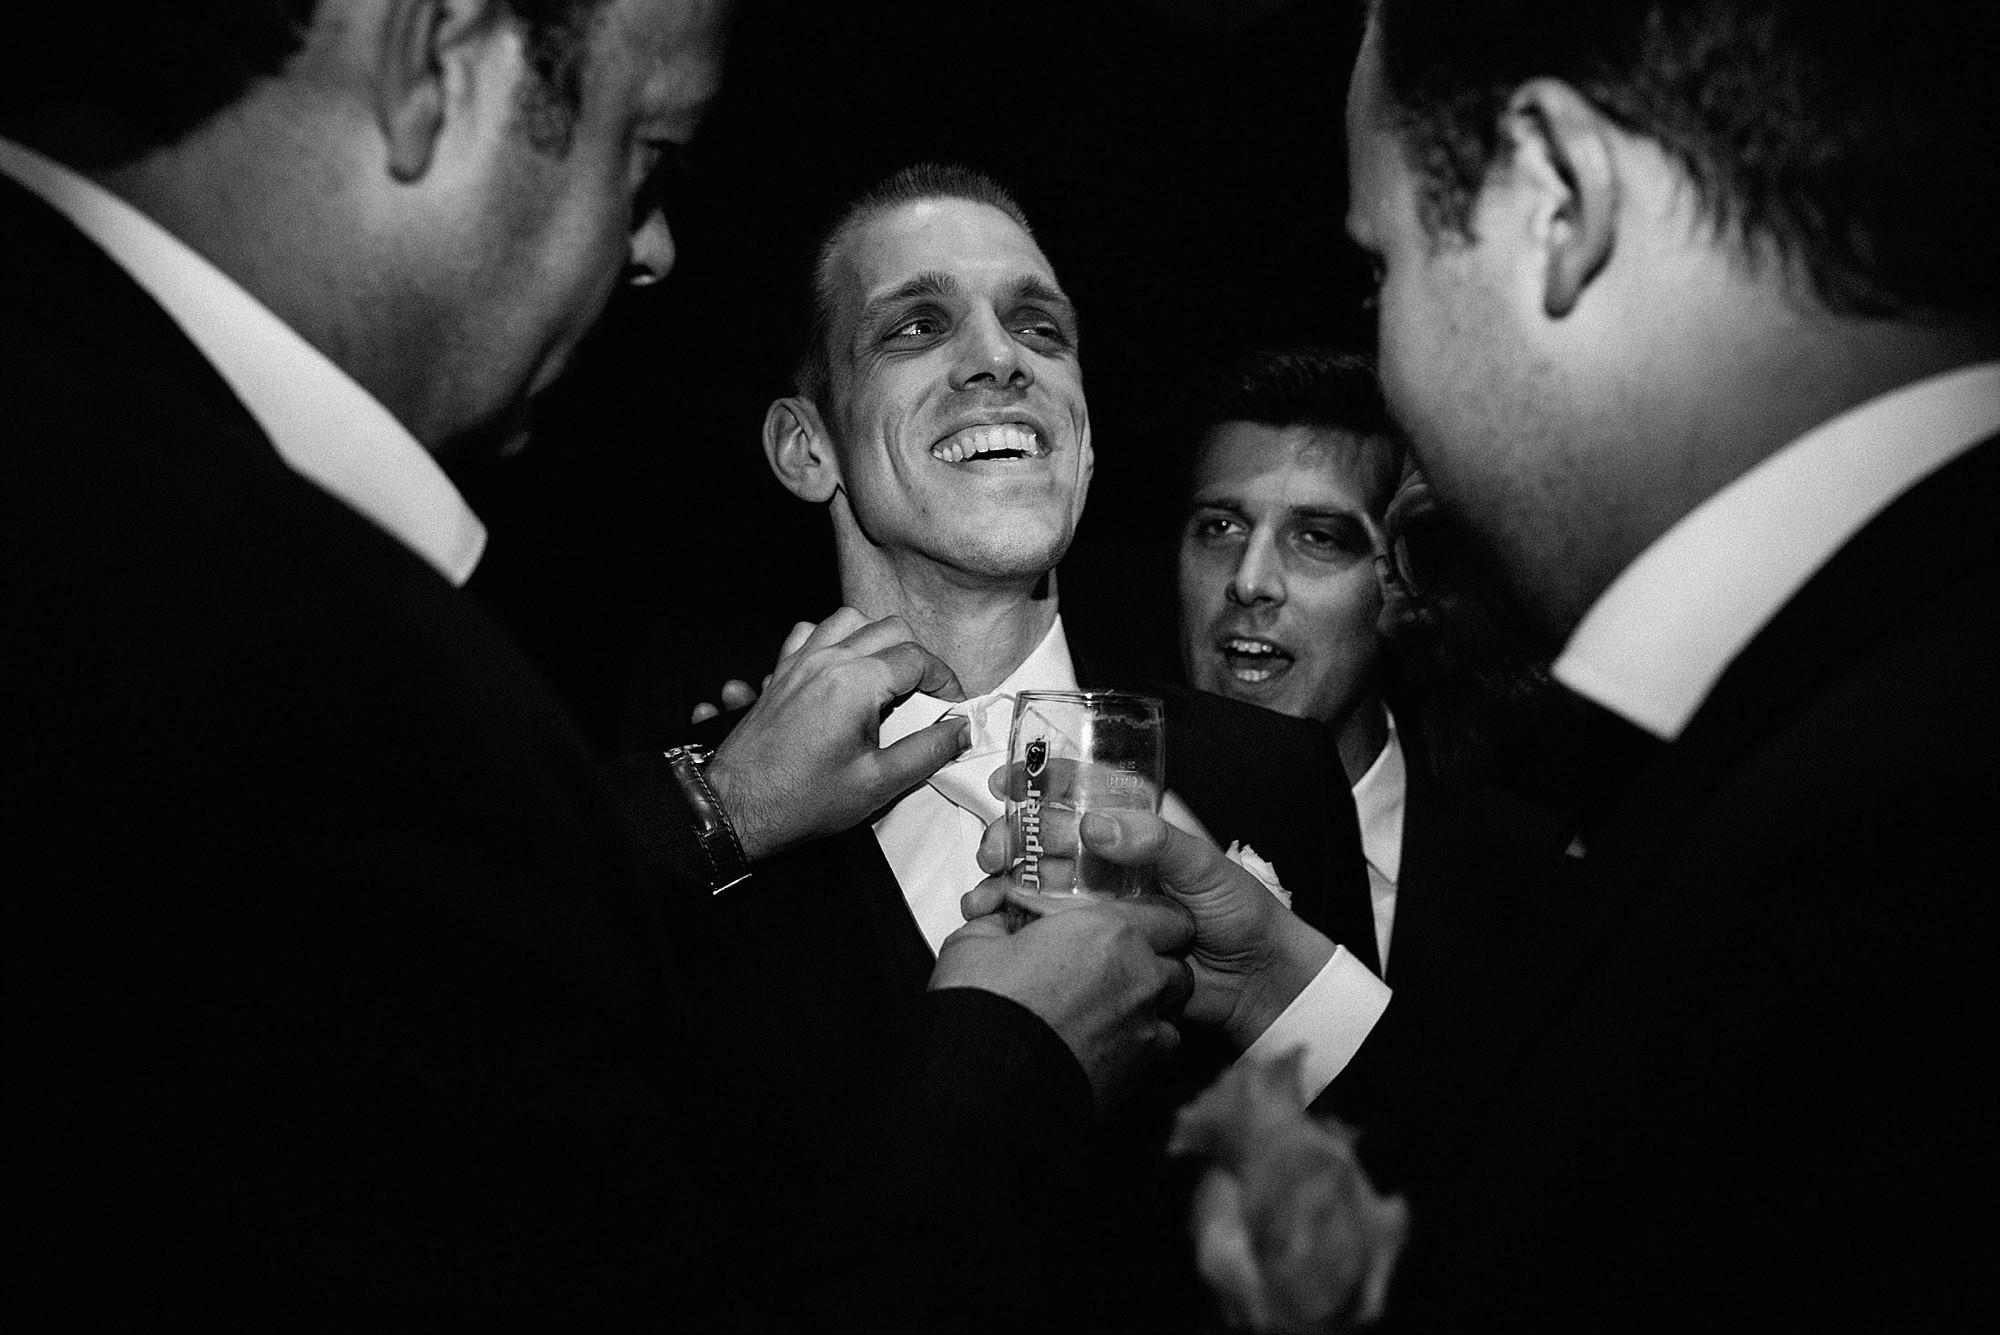 beste trouwfotograaf van nederland (67 van 69).jpg